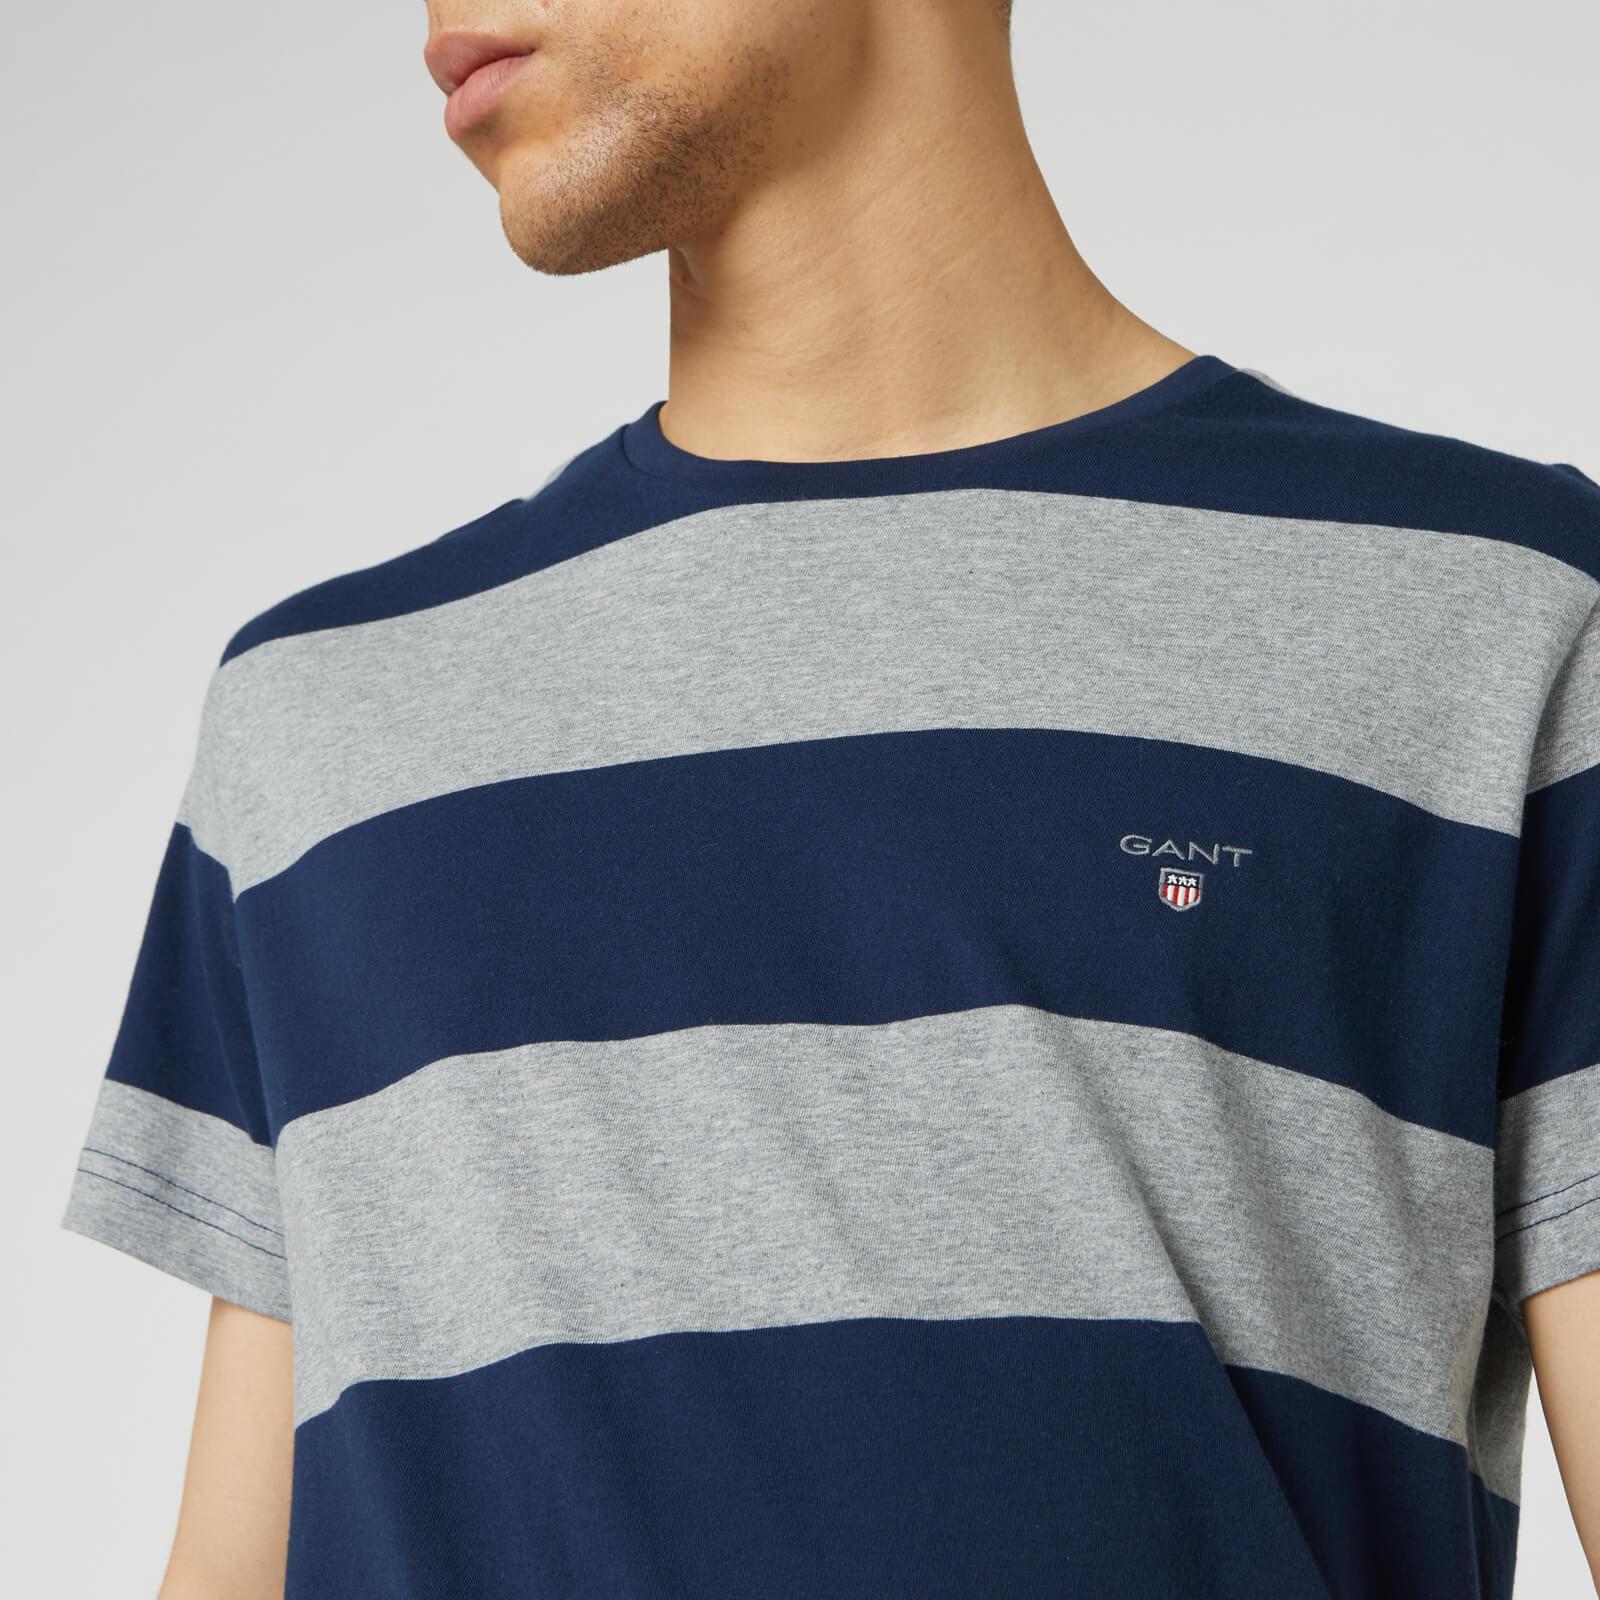 Gant Azul marino Multi Stripe de Superdry